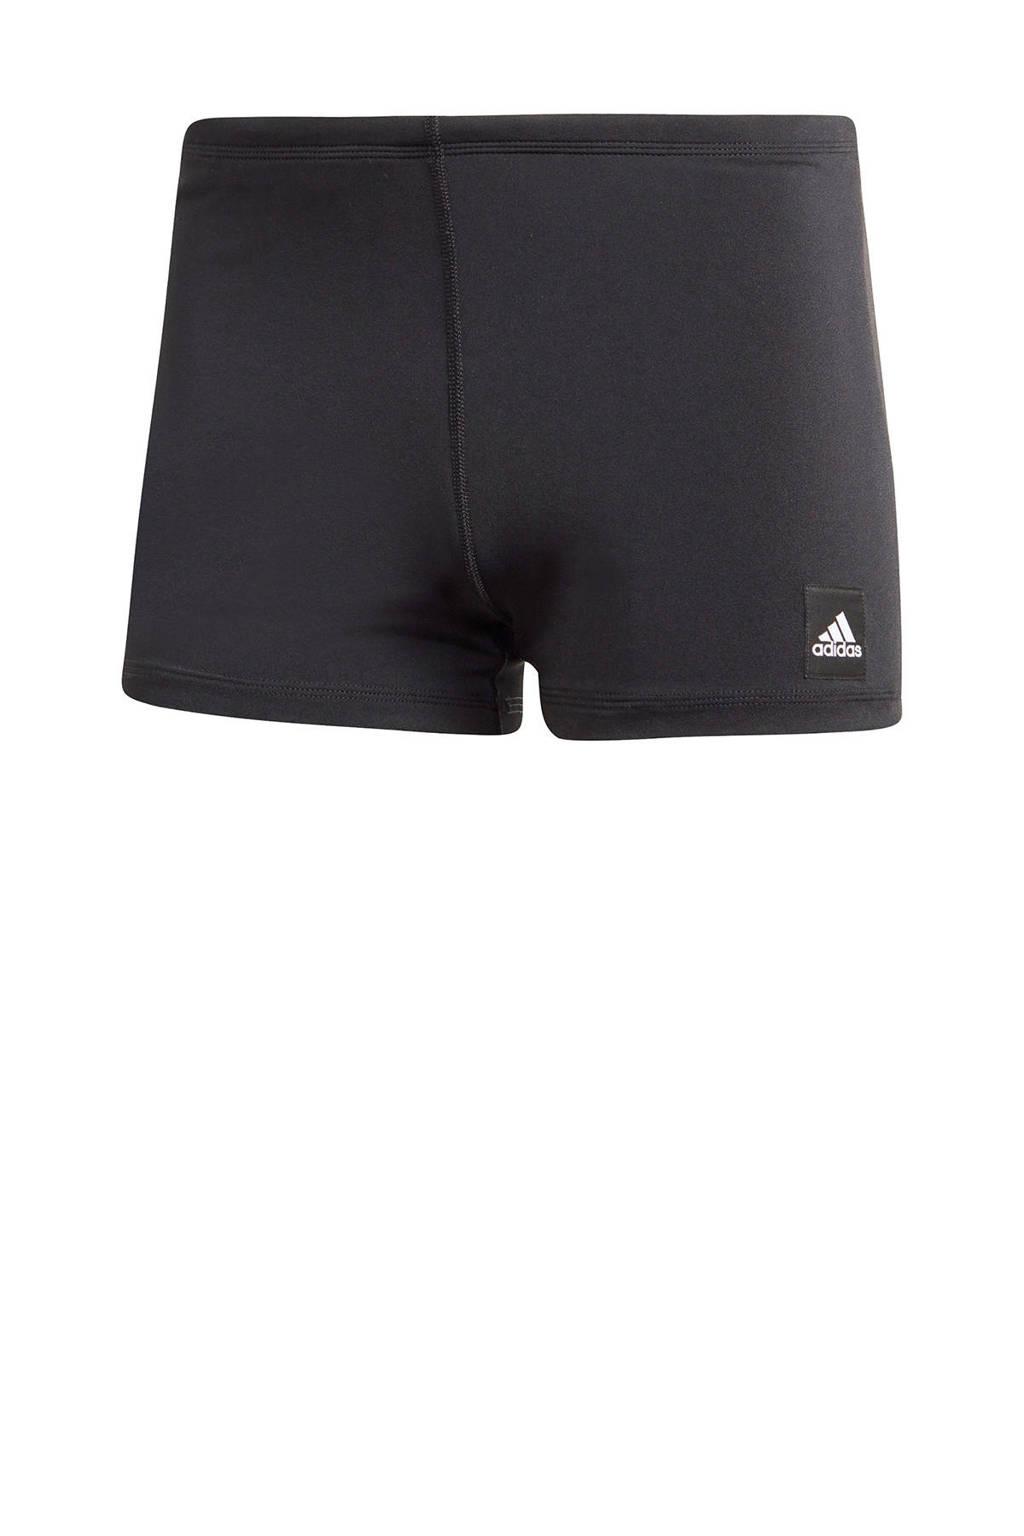 adidas infintex zwemboxer zwart, Zwart